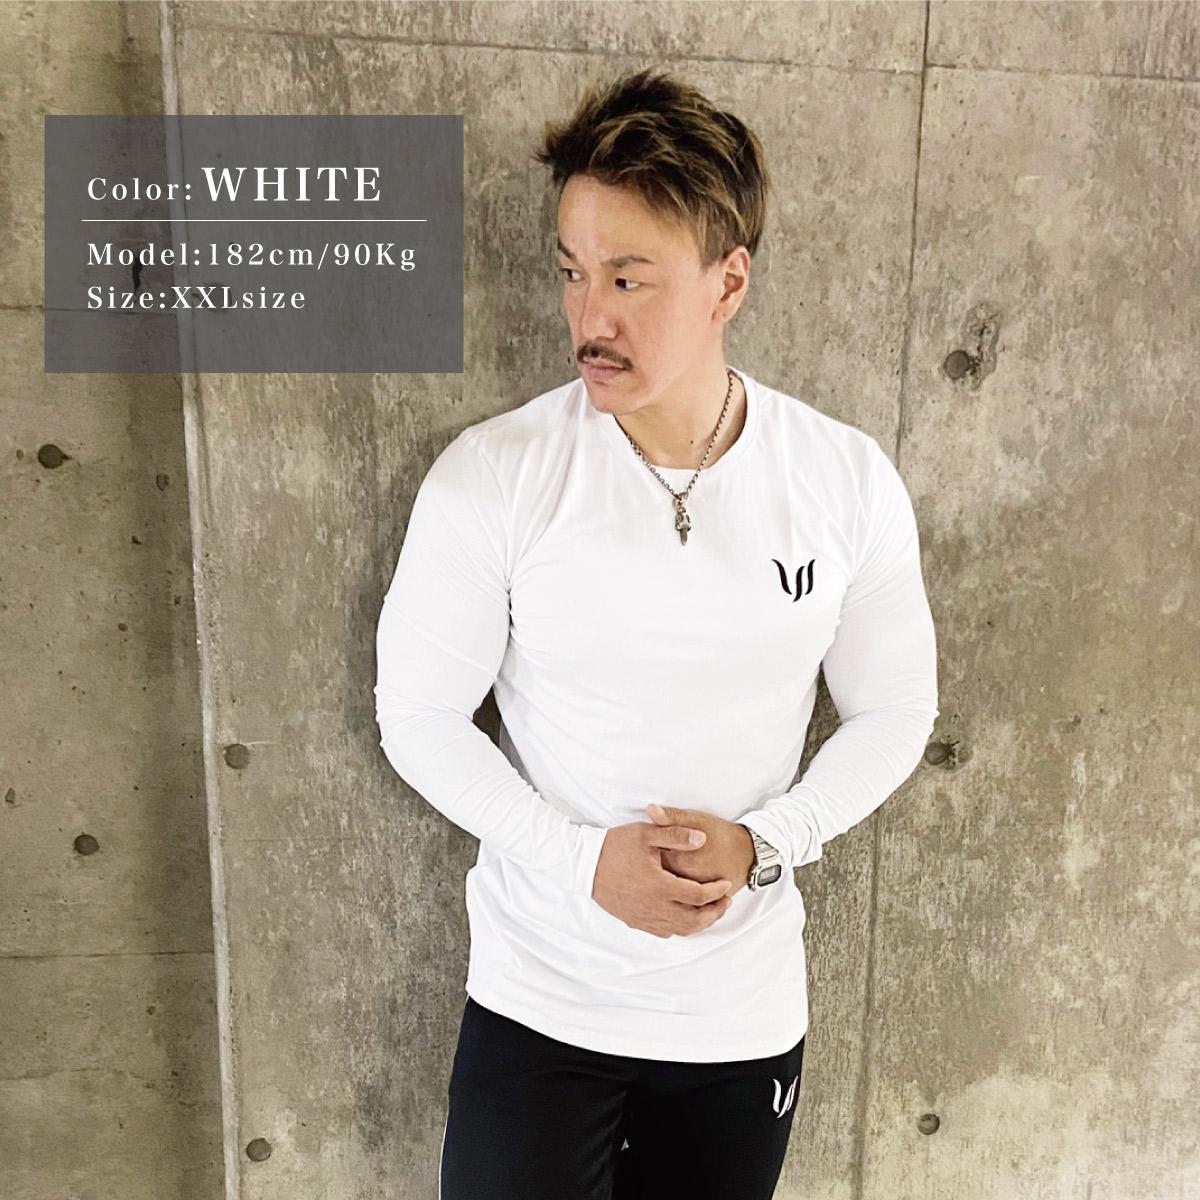 EMBROIDERY LONGSLEEVE - WHITE